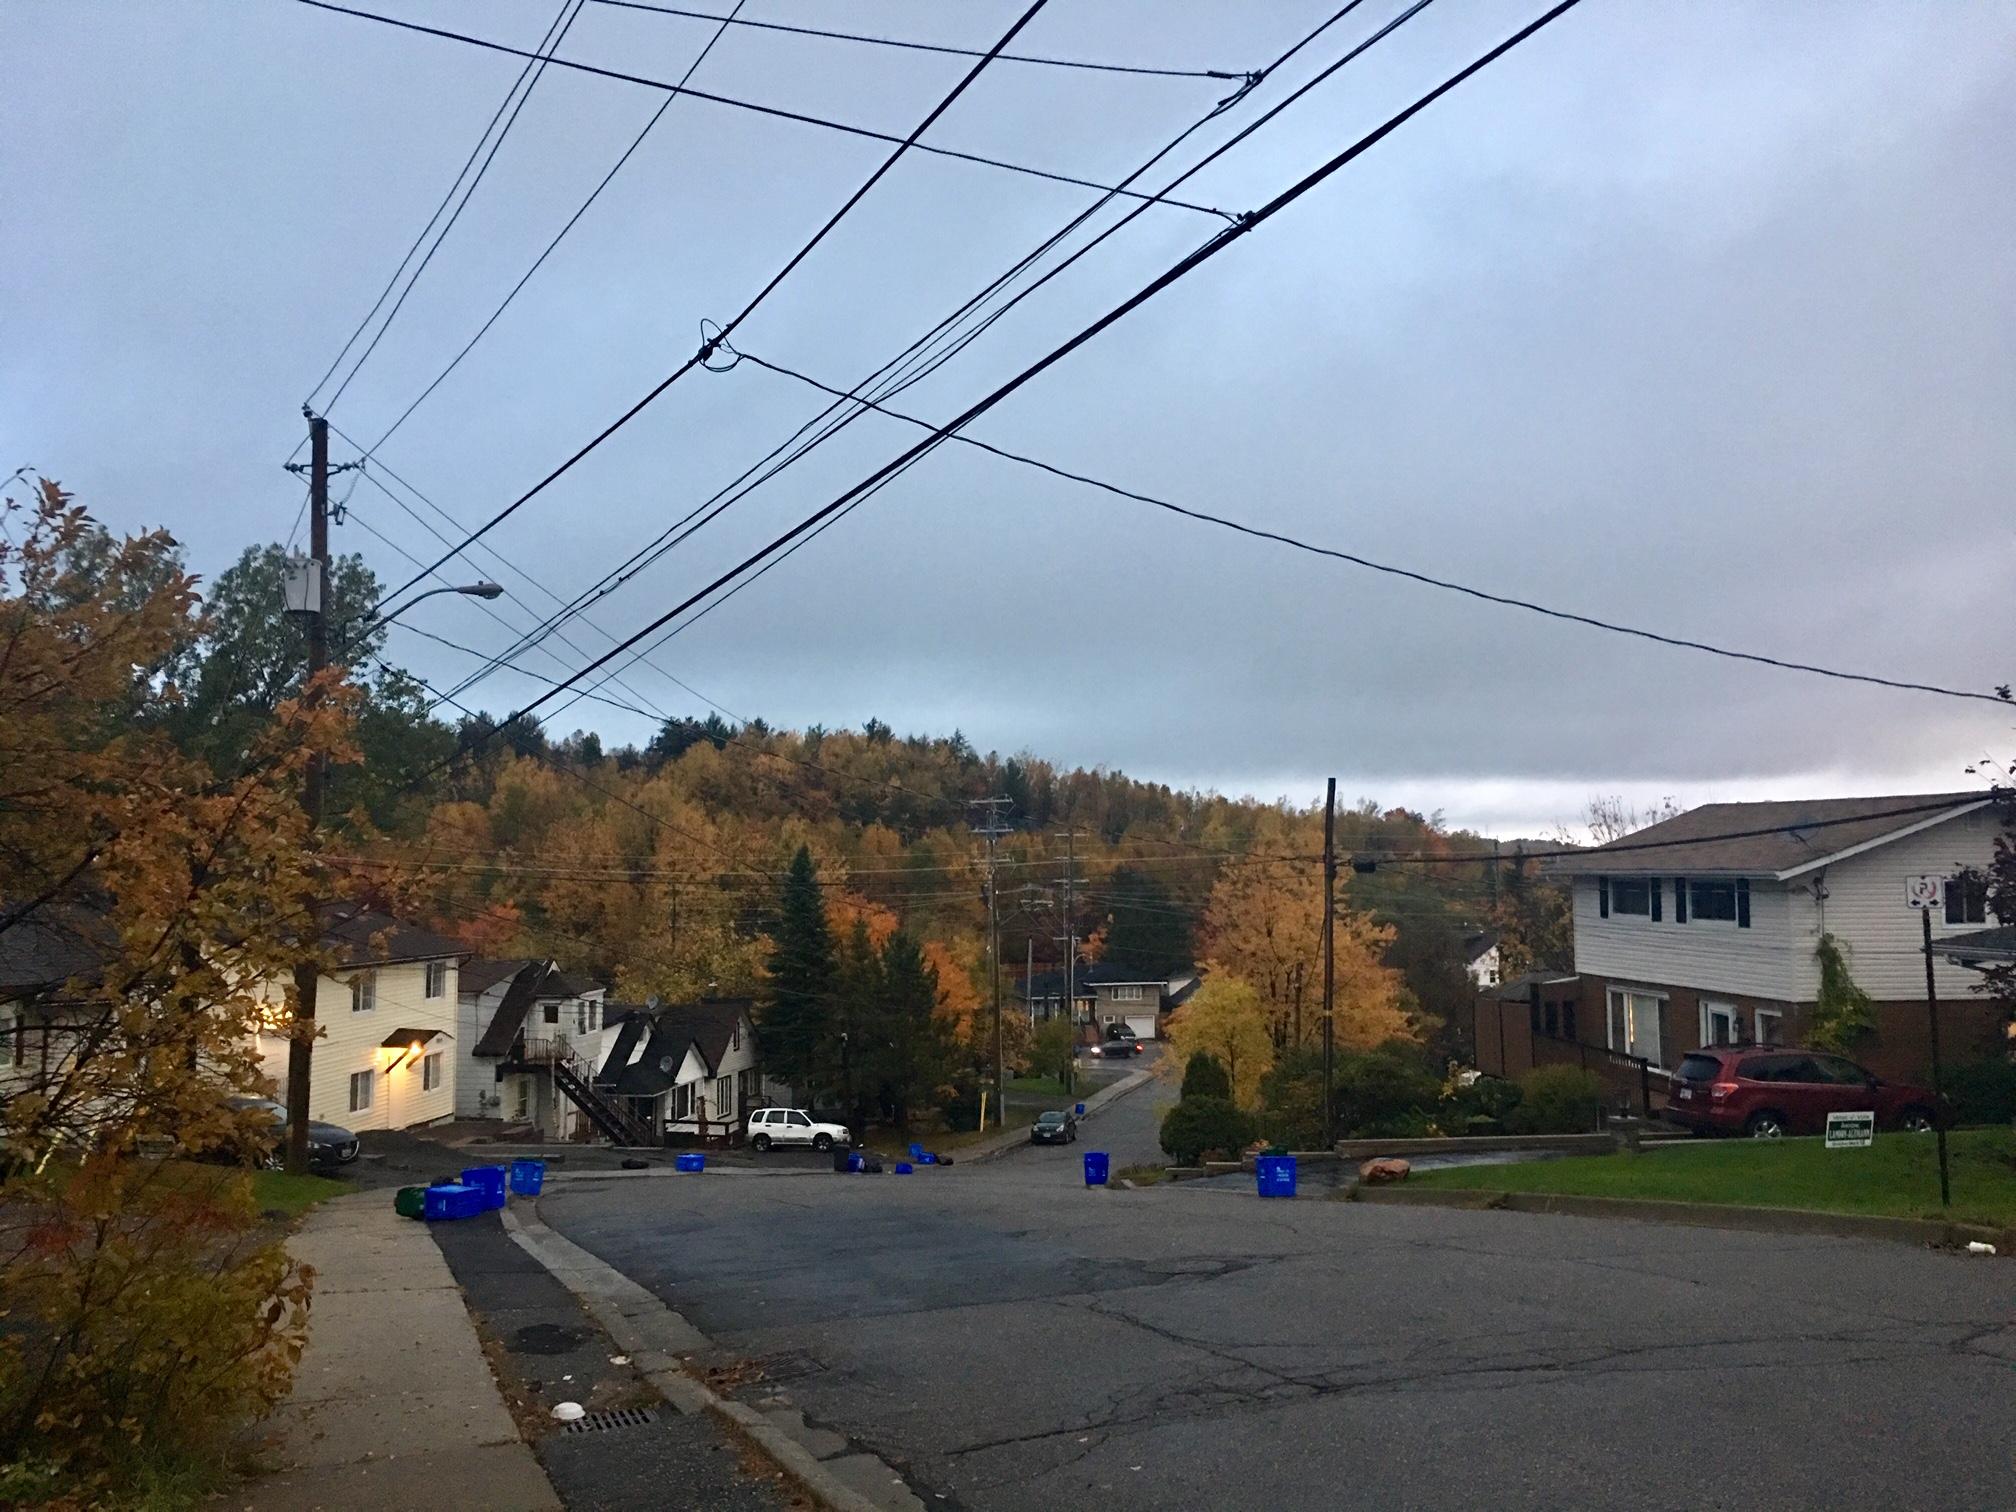 A suburban street in Sudbury, ON